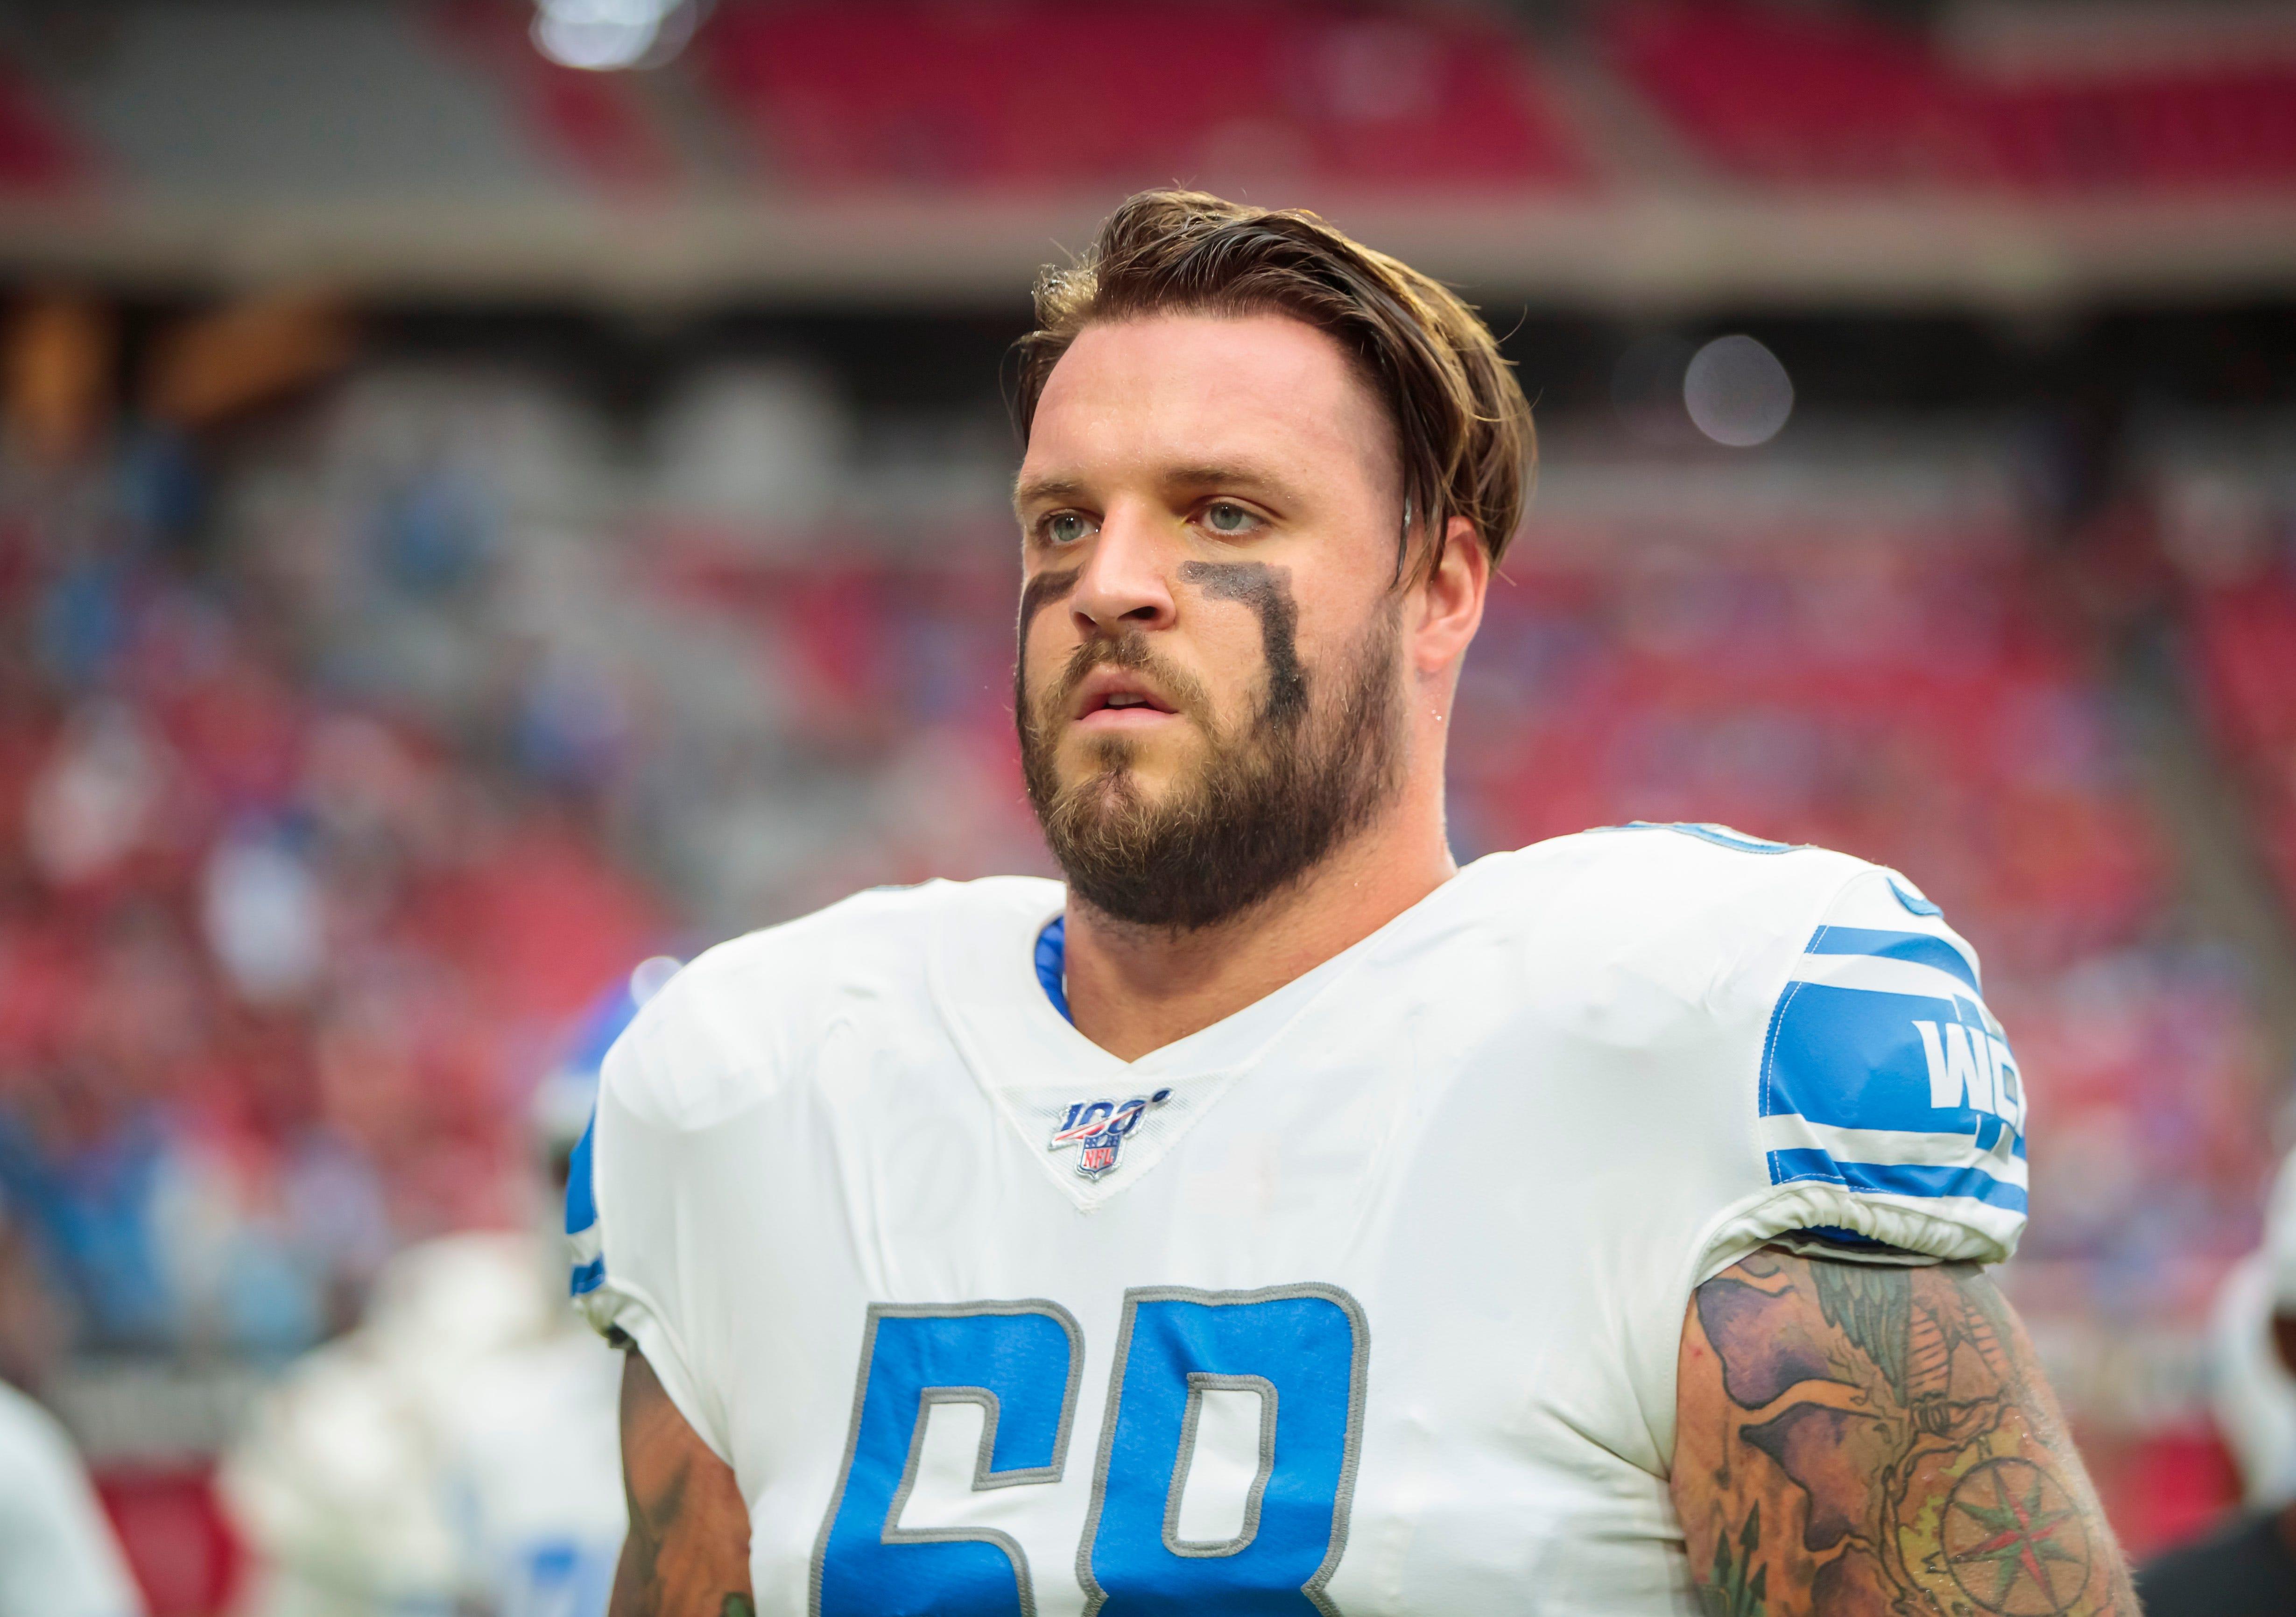 Detroit Lions' Taylor Decker: I'll lobby to keep Matthew Stafford